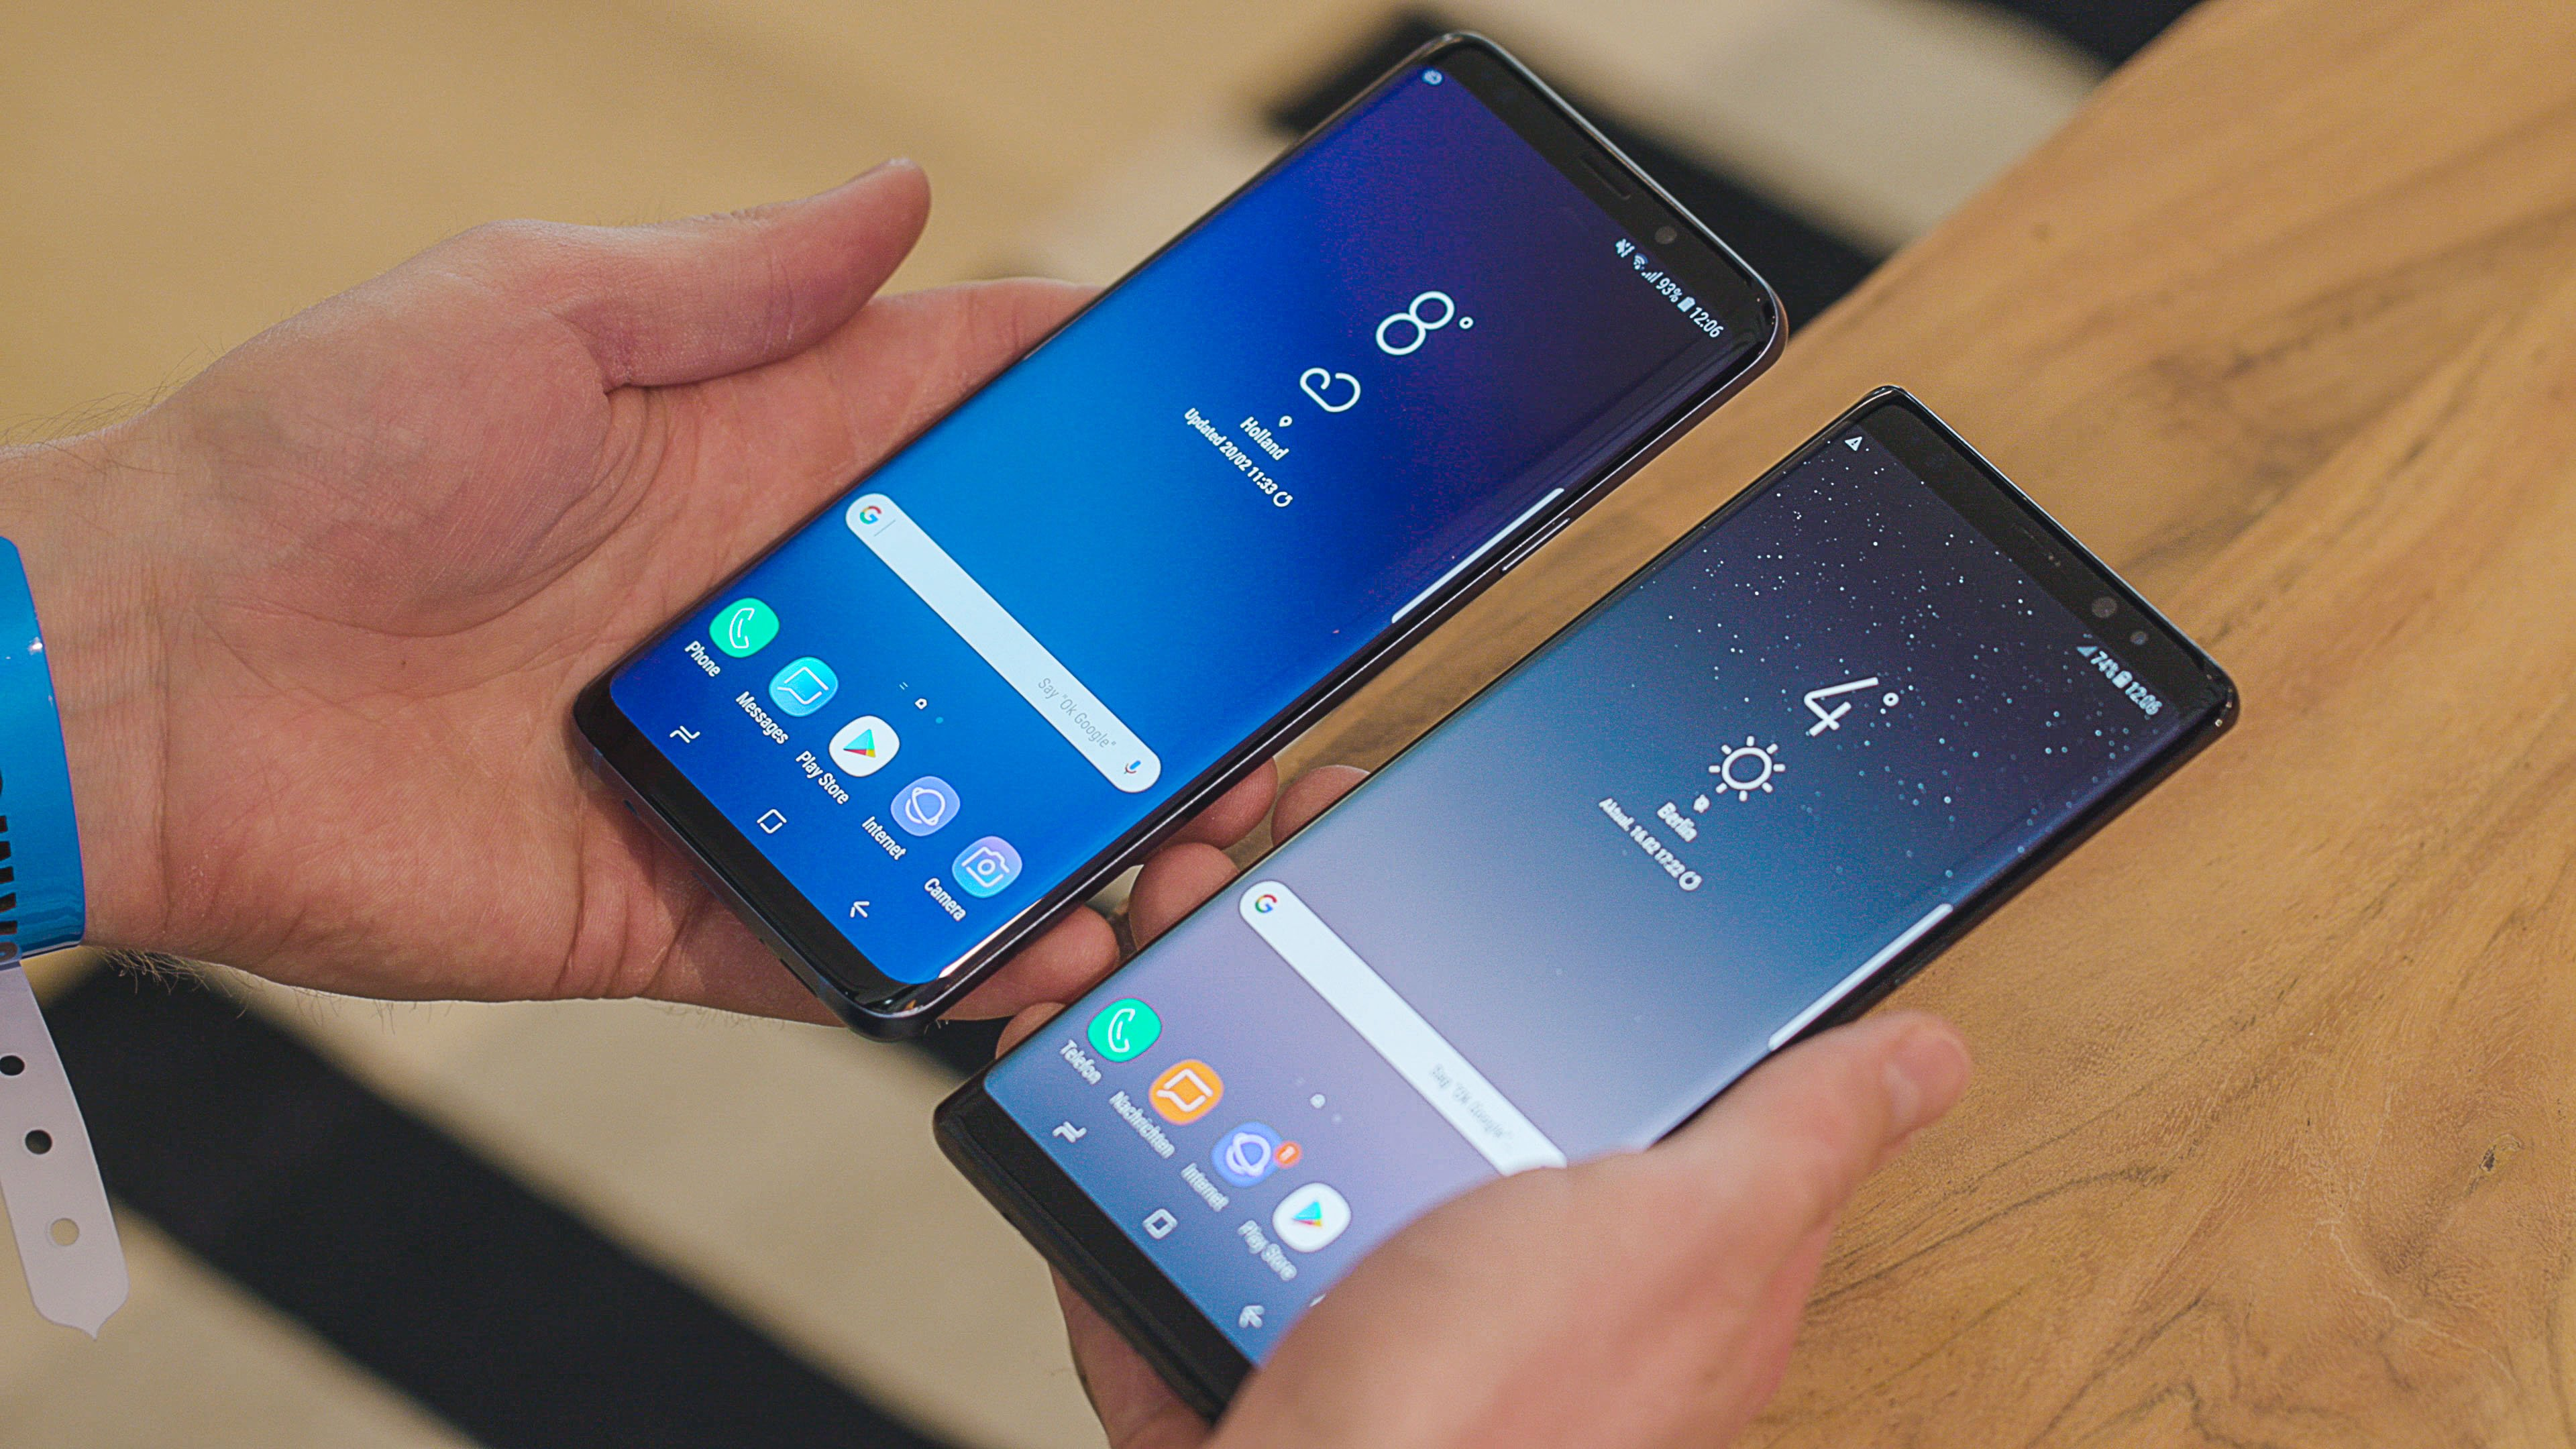 Samsung Galaxy S9 Note Plus